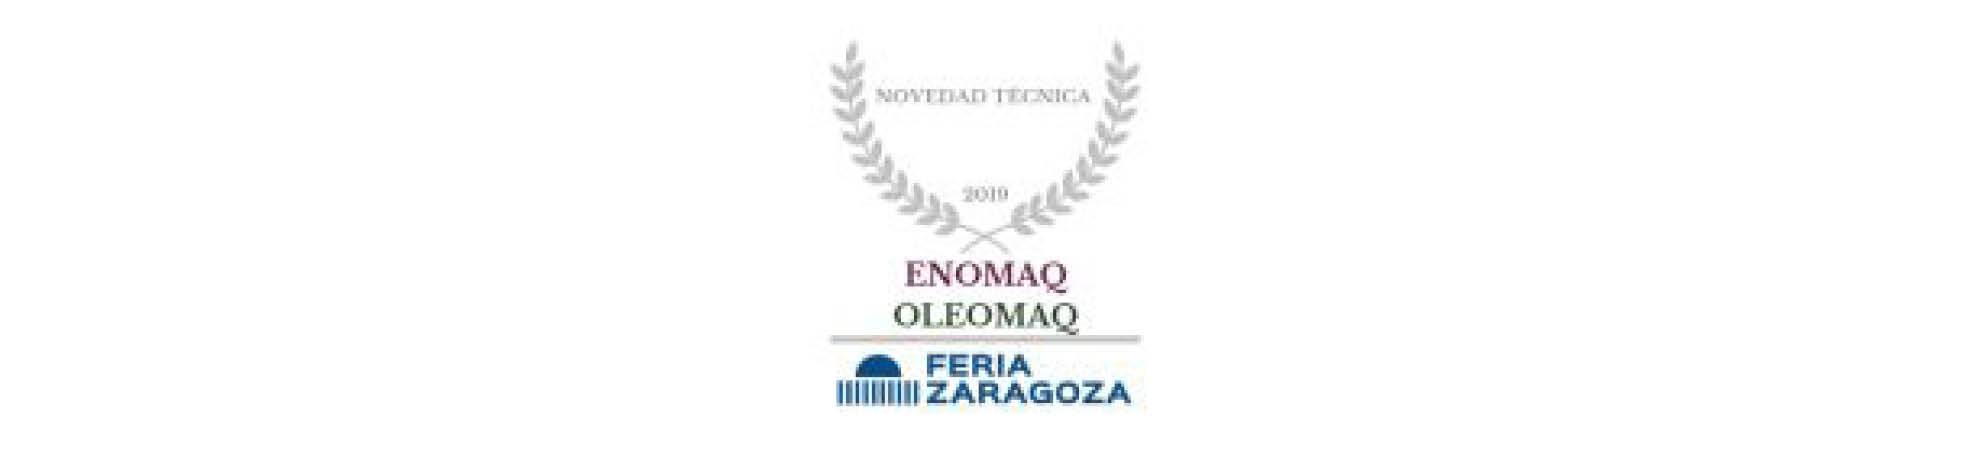 Enomaq Novedad Tecnica 2019 Oi Expressions3